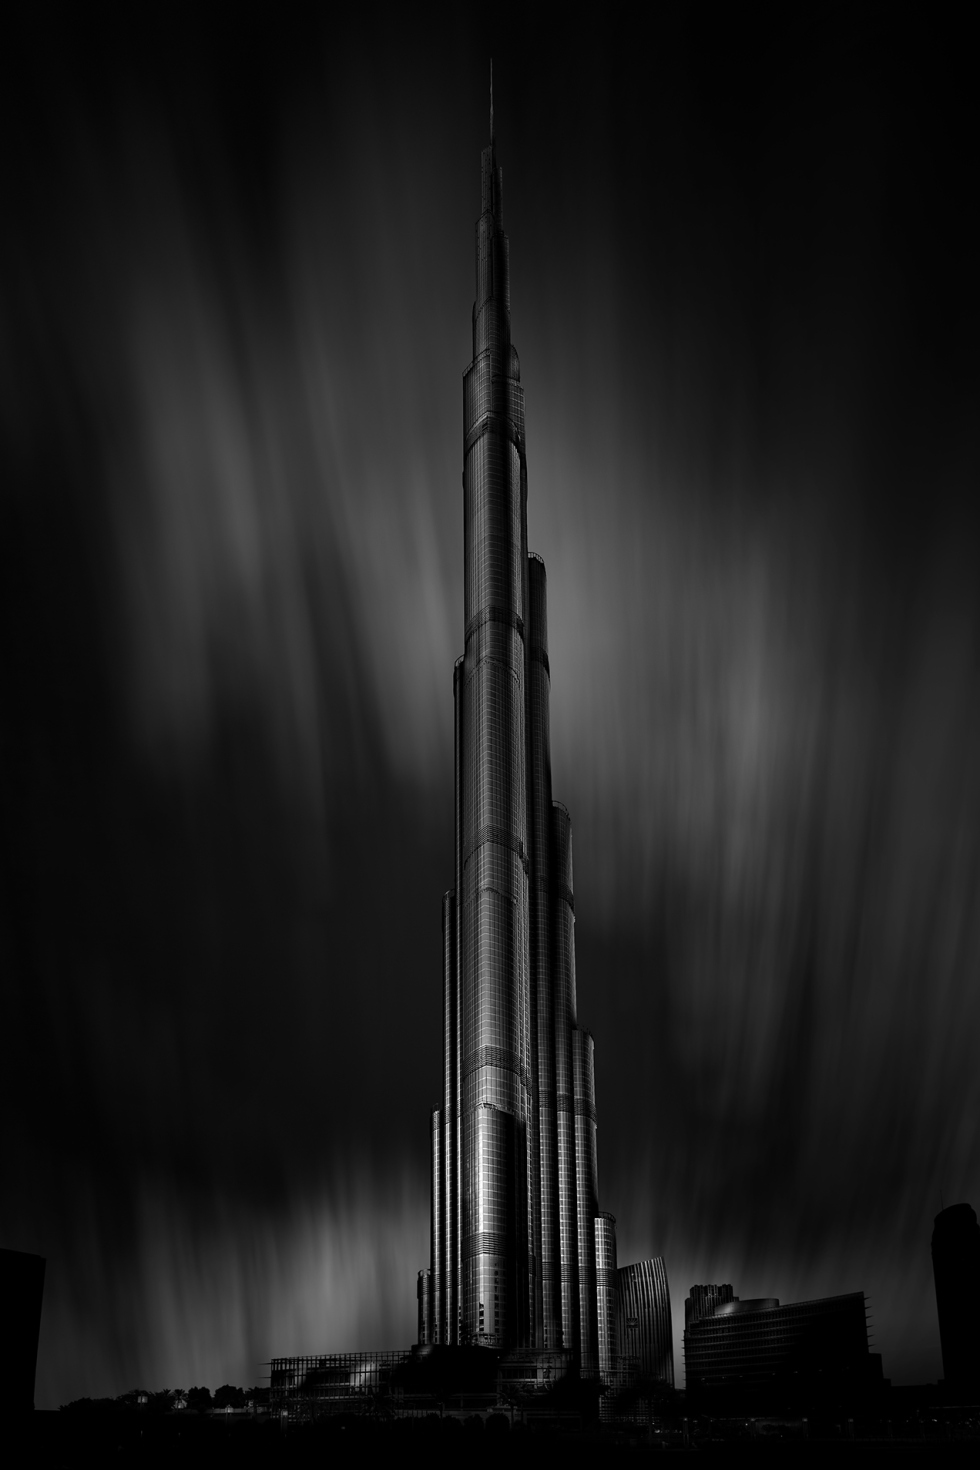 Burj Khalifa Architectural Fine Art Black and white © Michael Evans Photographer 2016 - www.michaelevansphotographer.com